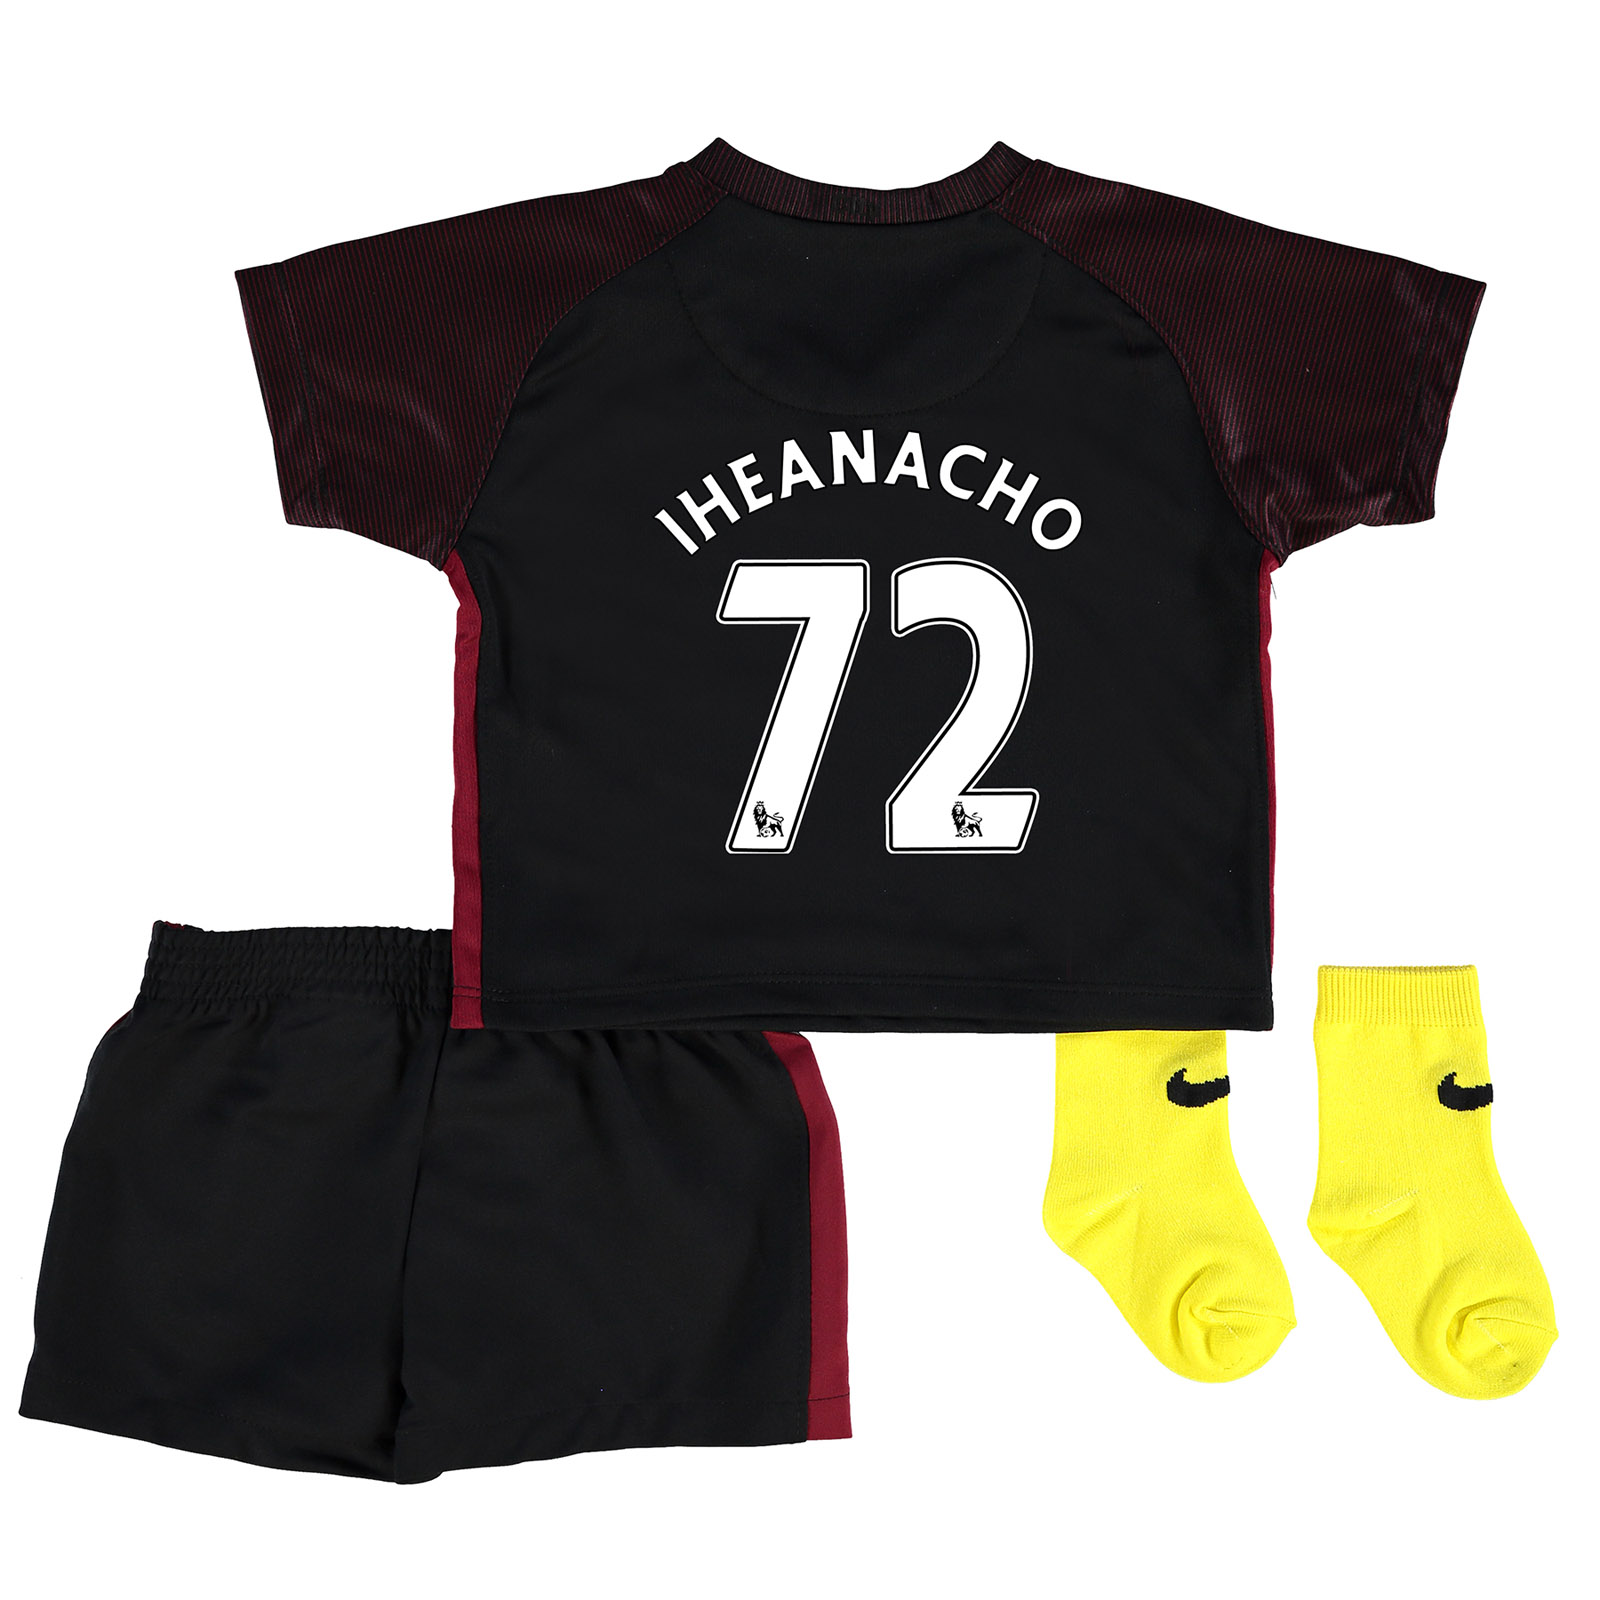 Manchester City Away Stadium Kit 2016-17 - Infants with Iheanacho 72 p